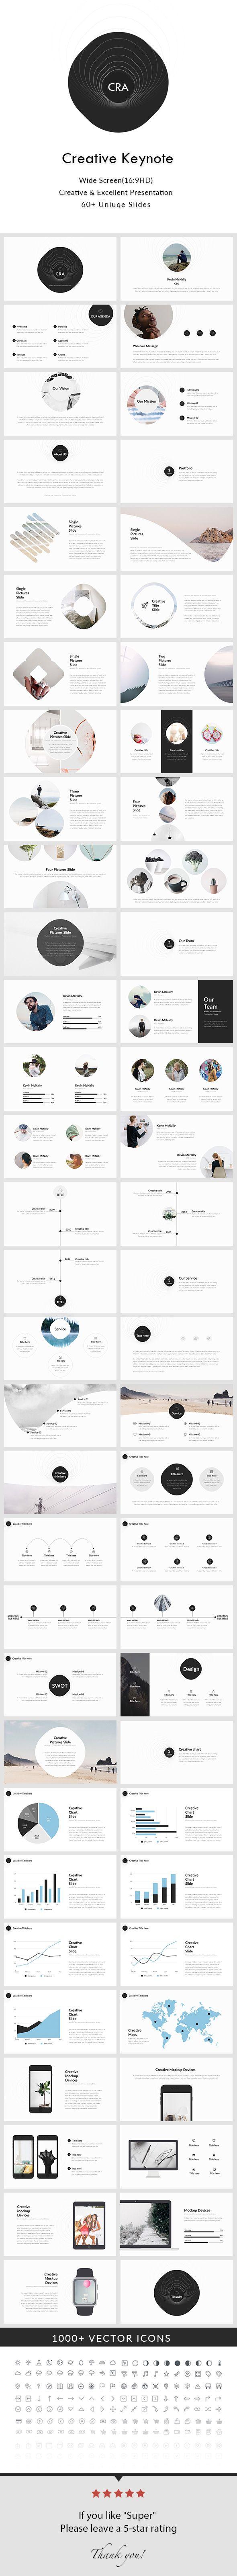 Creative - Keynote Presentation Template - Creative Keynote Templates